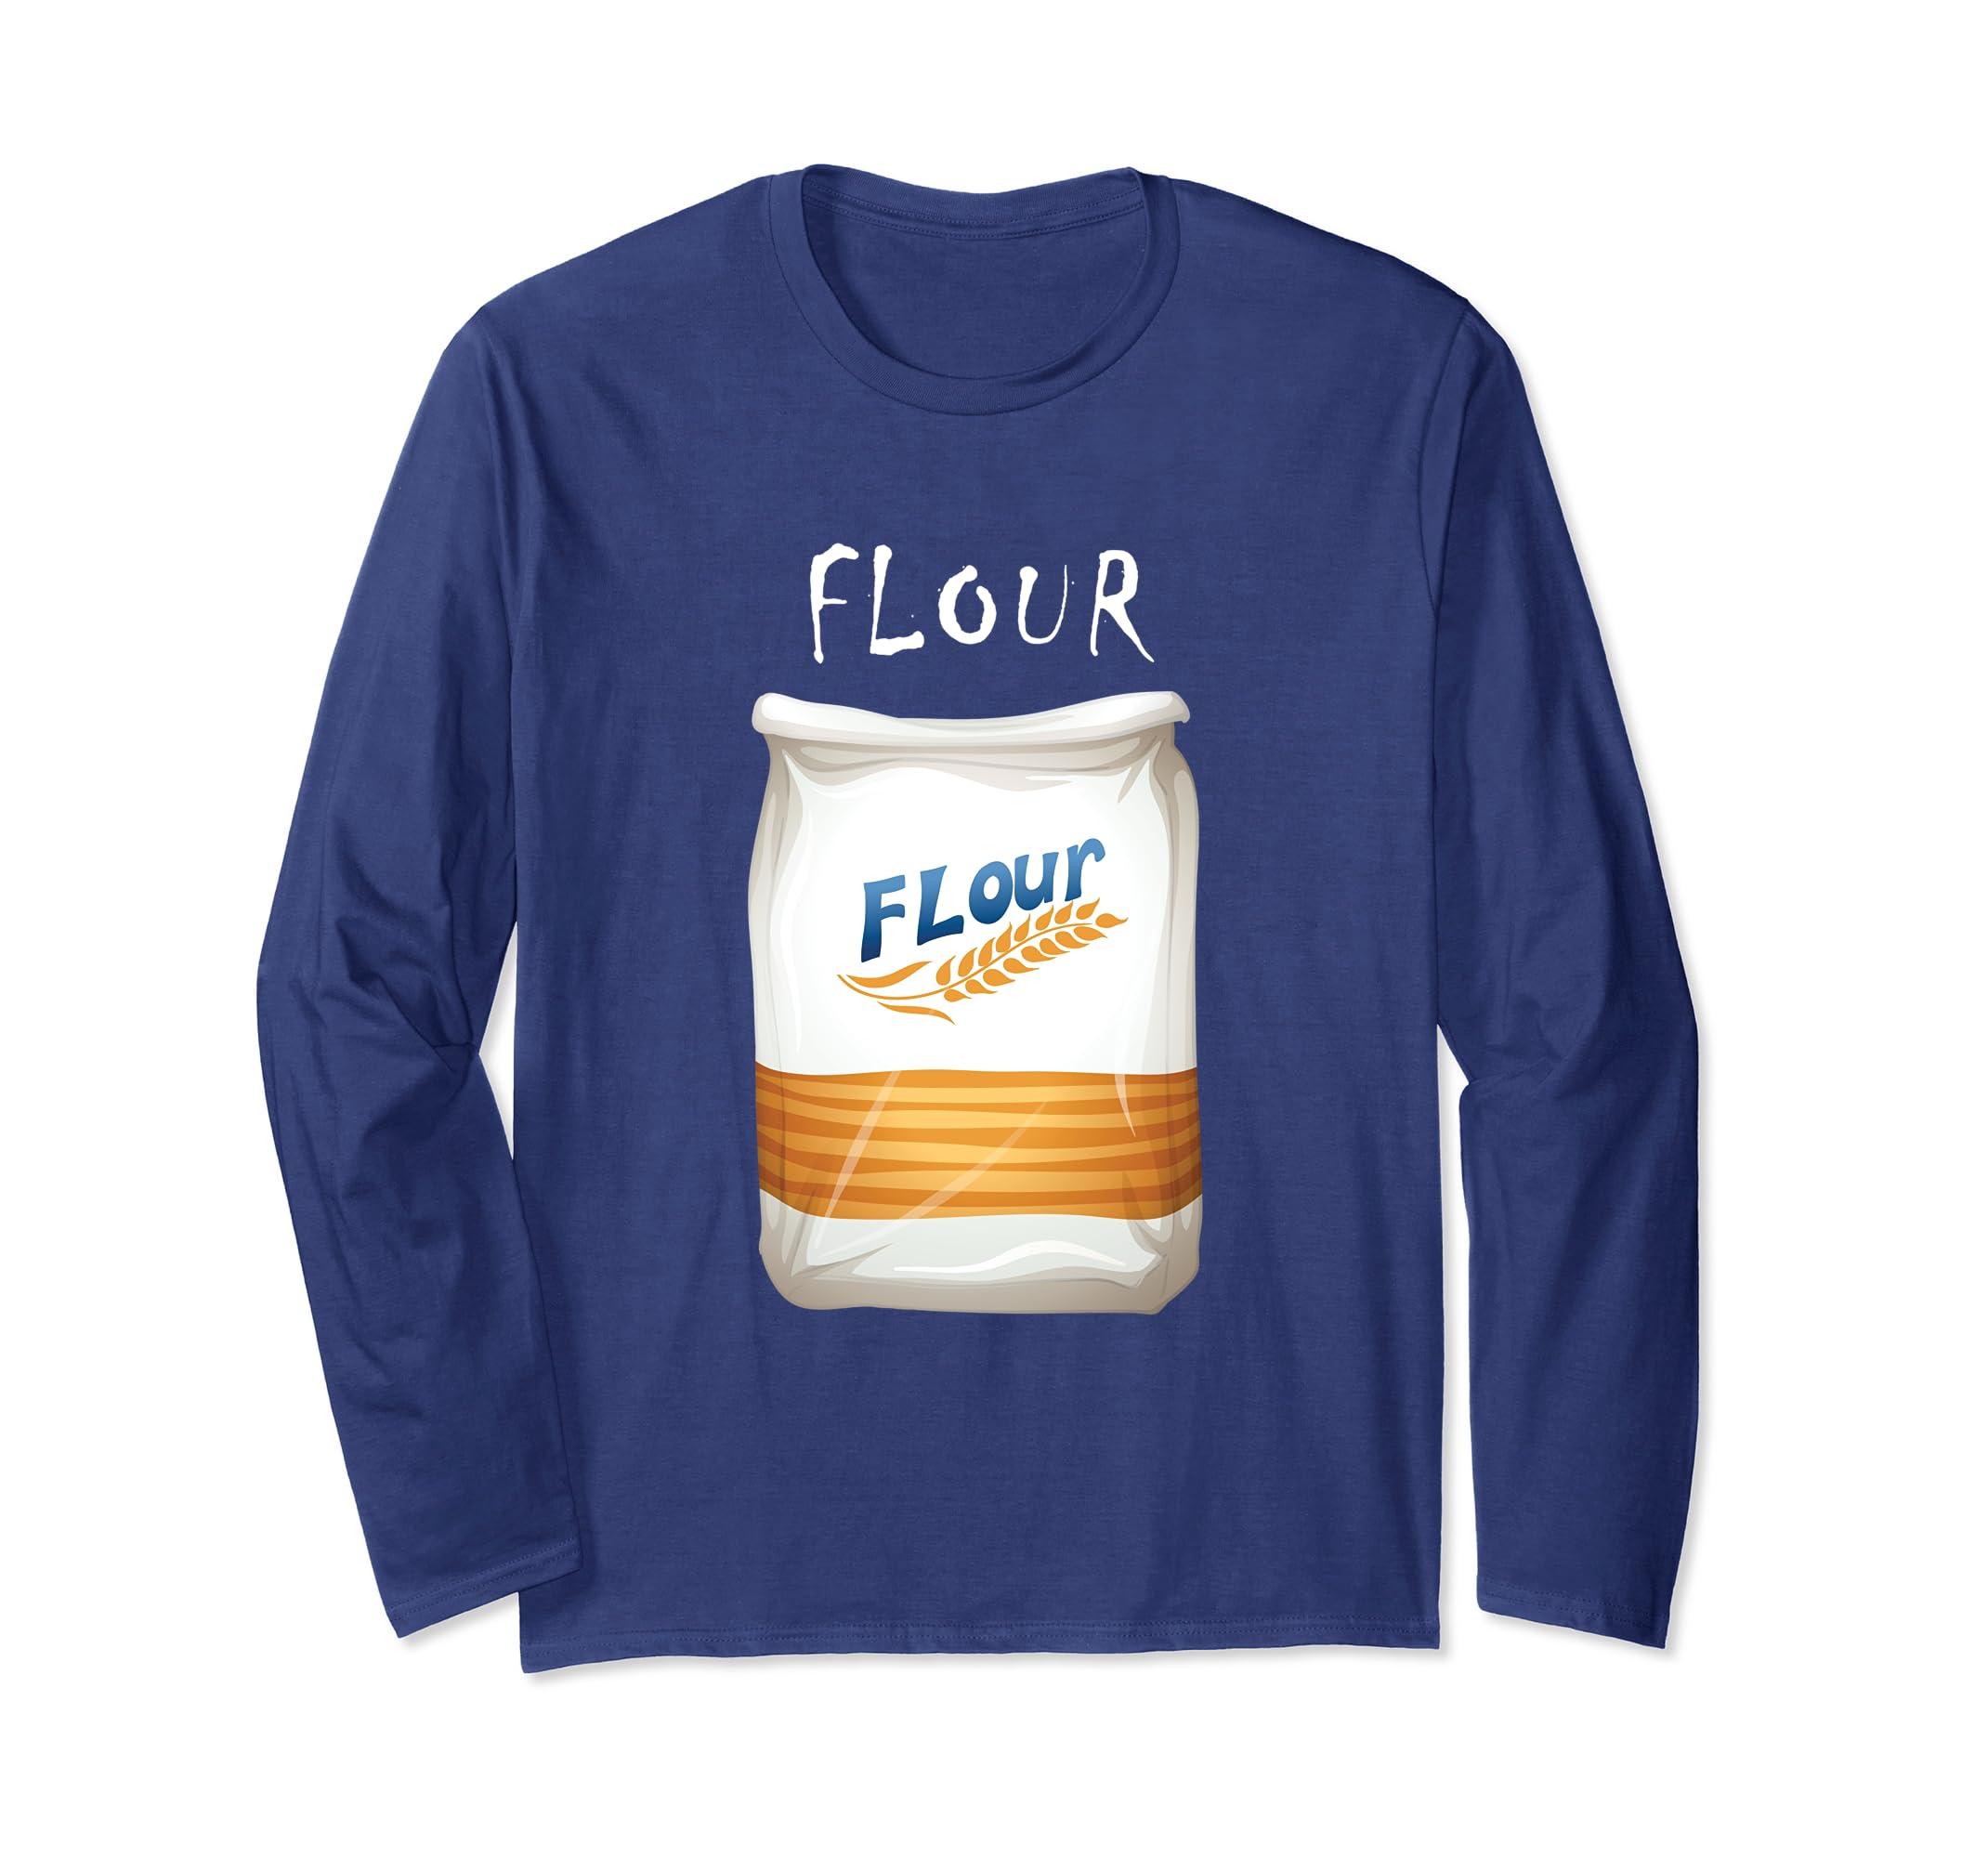 Flour Halloween Costume Long Sleeve T shirt-Bawle